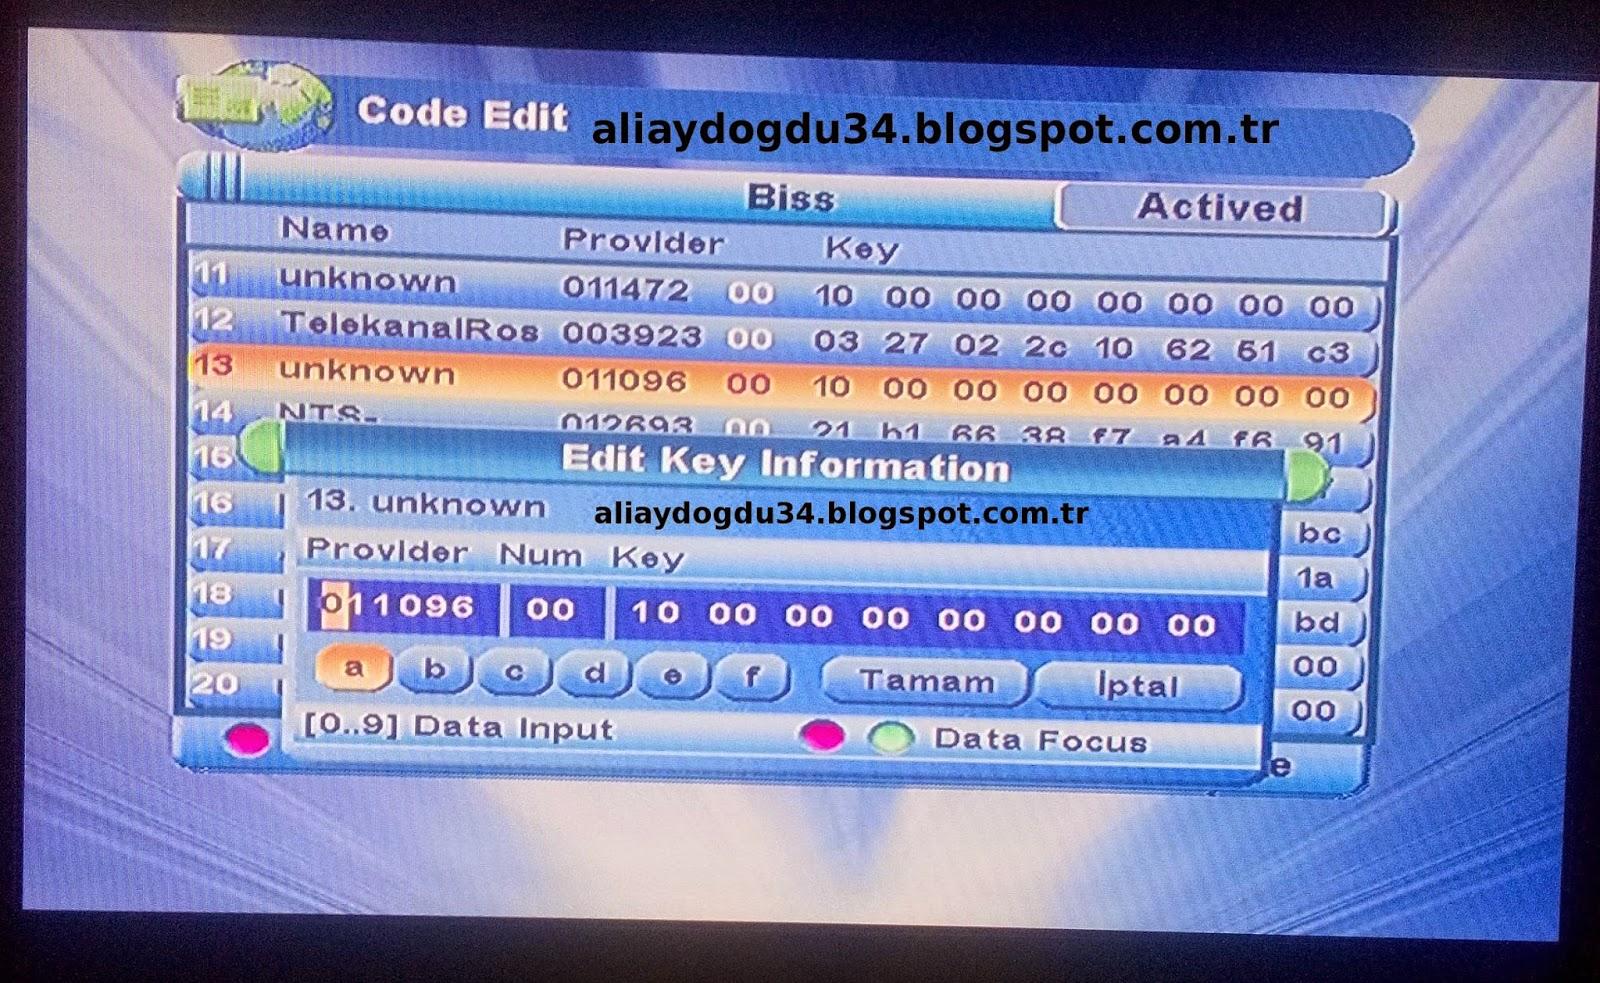 trt_spor_biss_key_uydu_sifresi